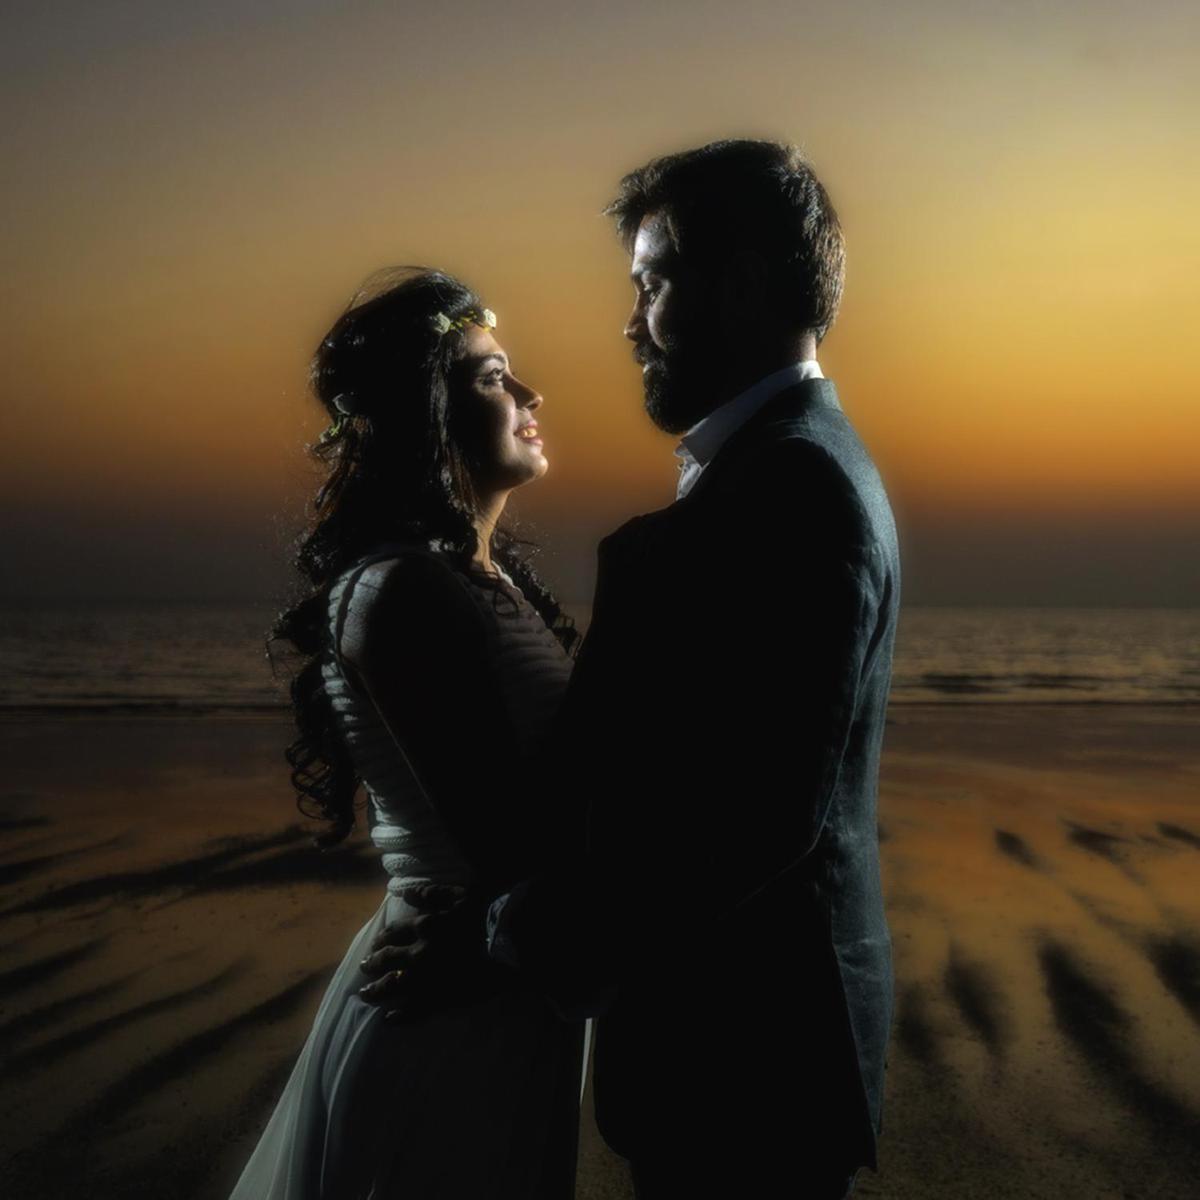 Image of Photograph, Romance, Sky, Love, Backlighting, Photography etc.